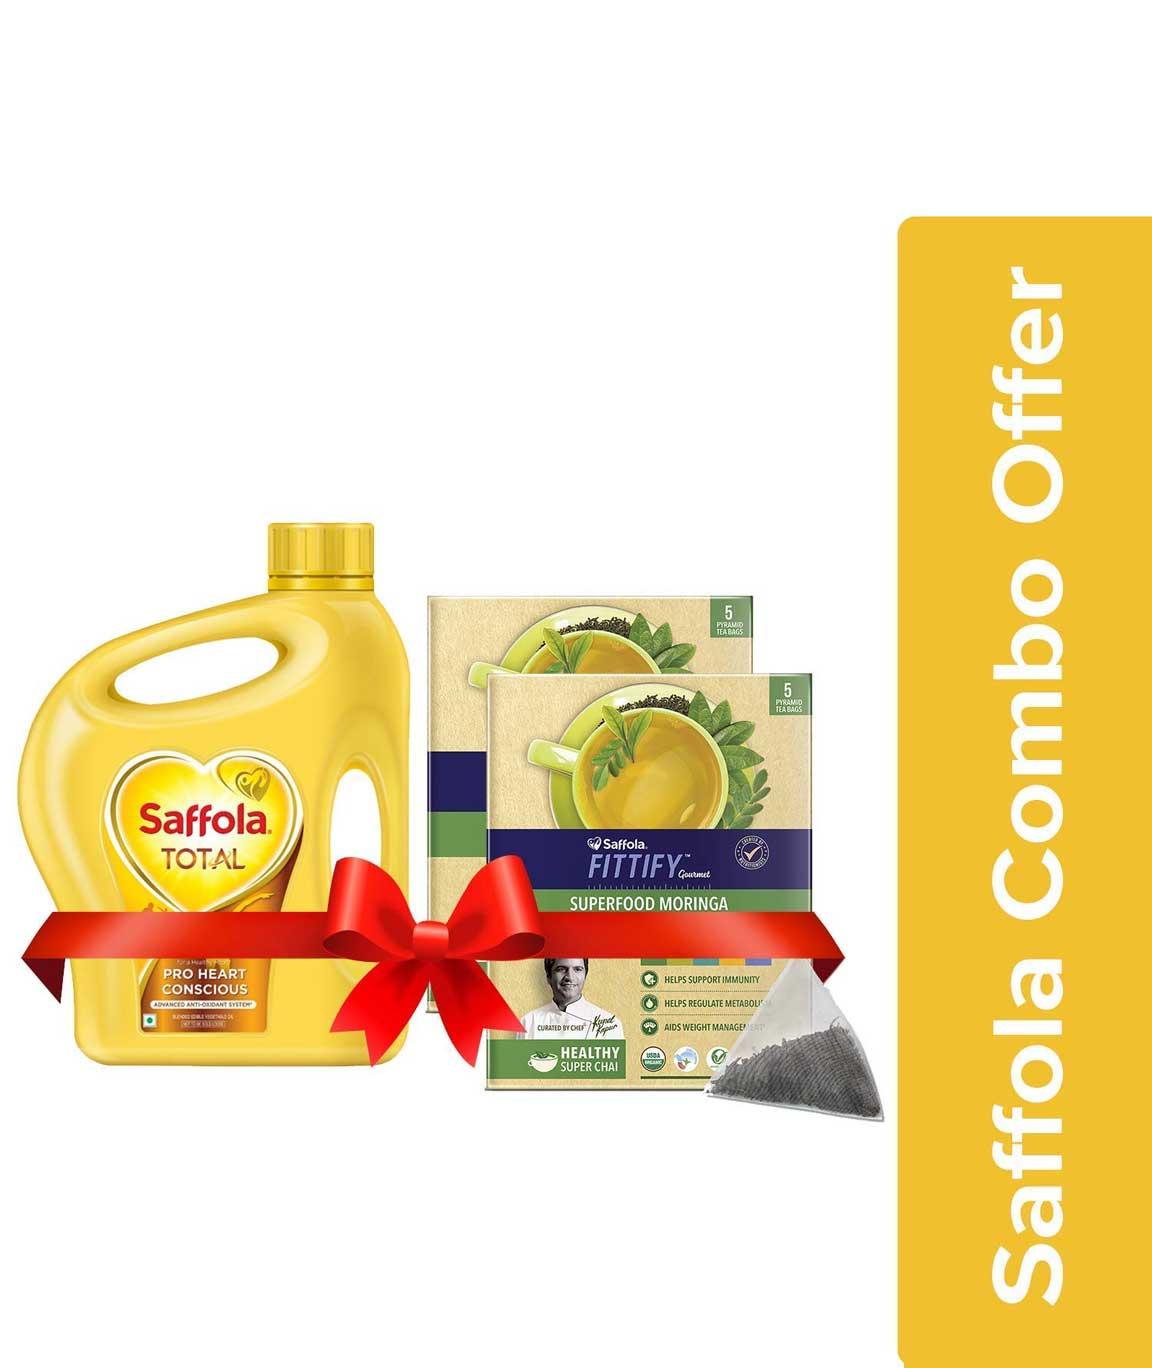 Saffola Total Pro Heart Conscious Edible Oil, 2 L